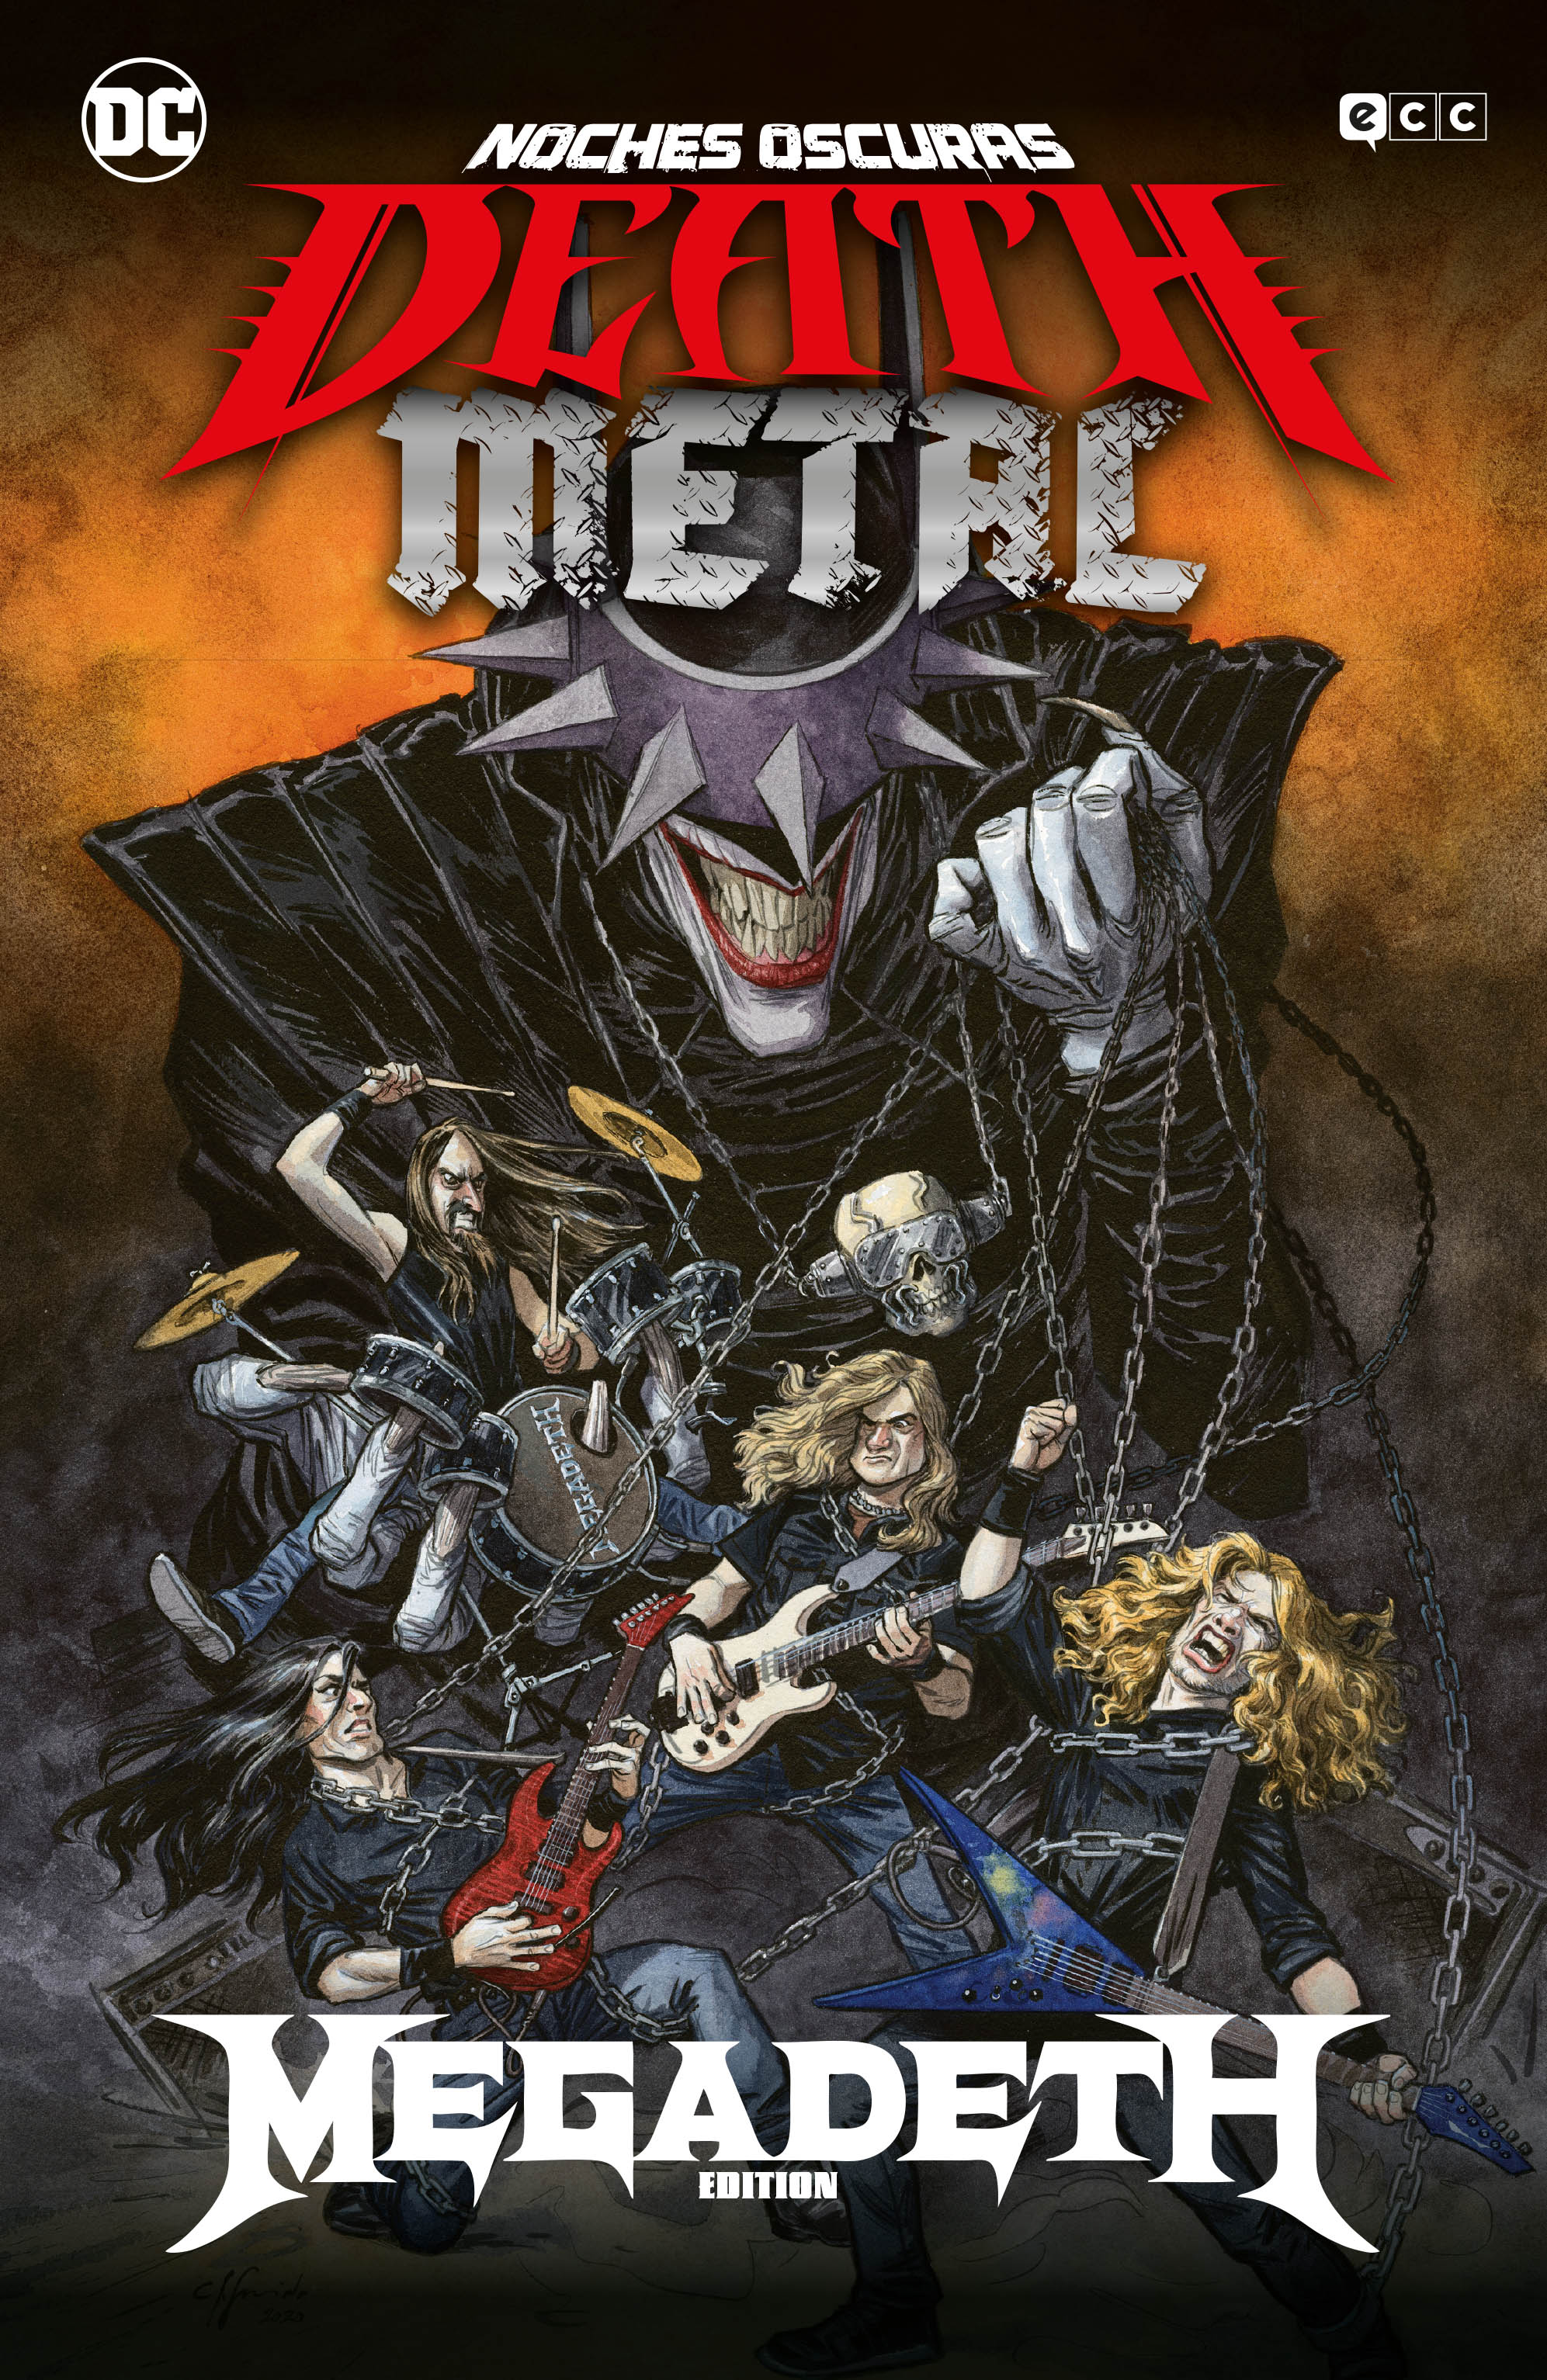 ECC Noches oscuras: Death Metal núm. 01 de 7 (Megadeth Band Edition) (Rústica)